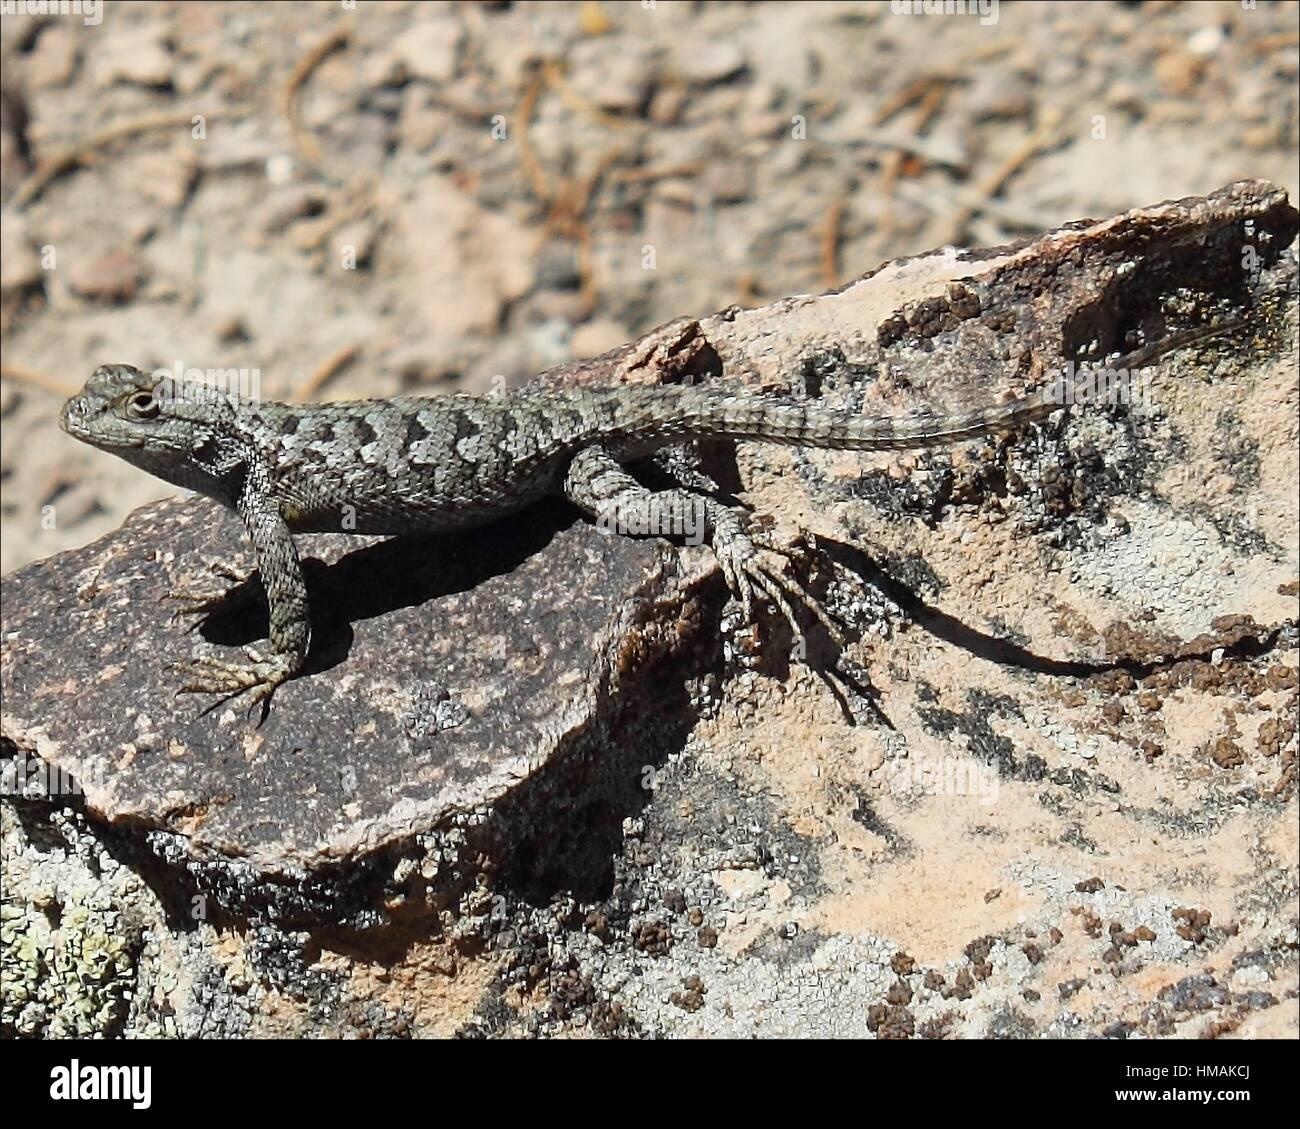 A lizard suns itself on a warm rock in Elko, Nevada. - Stock Image